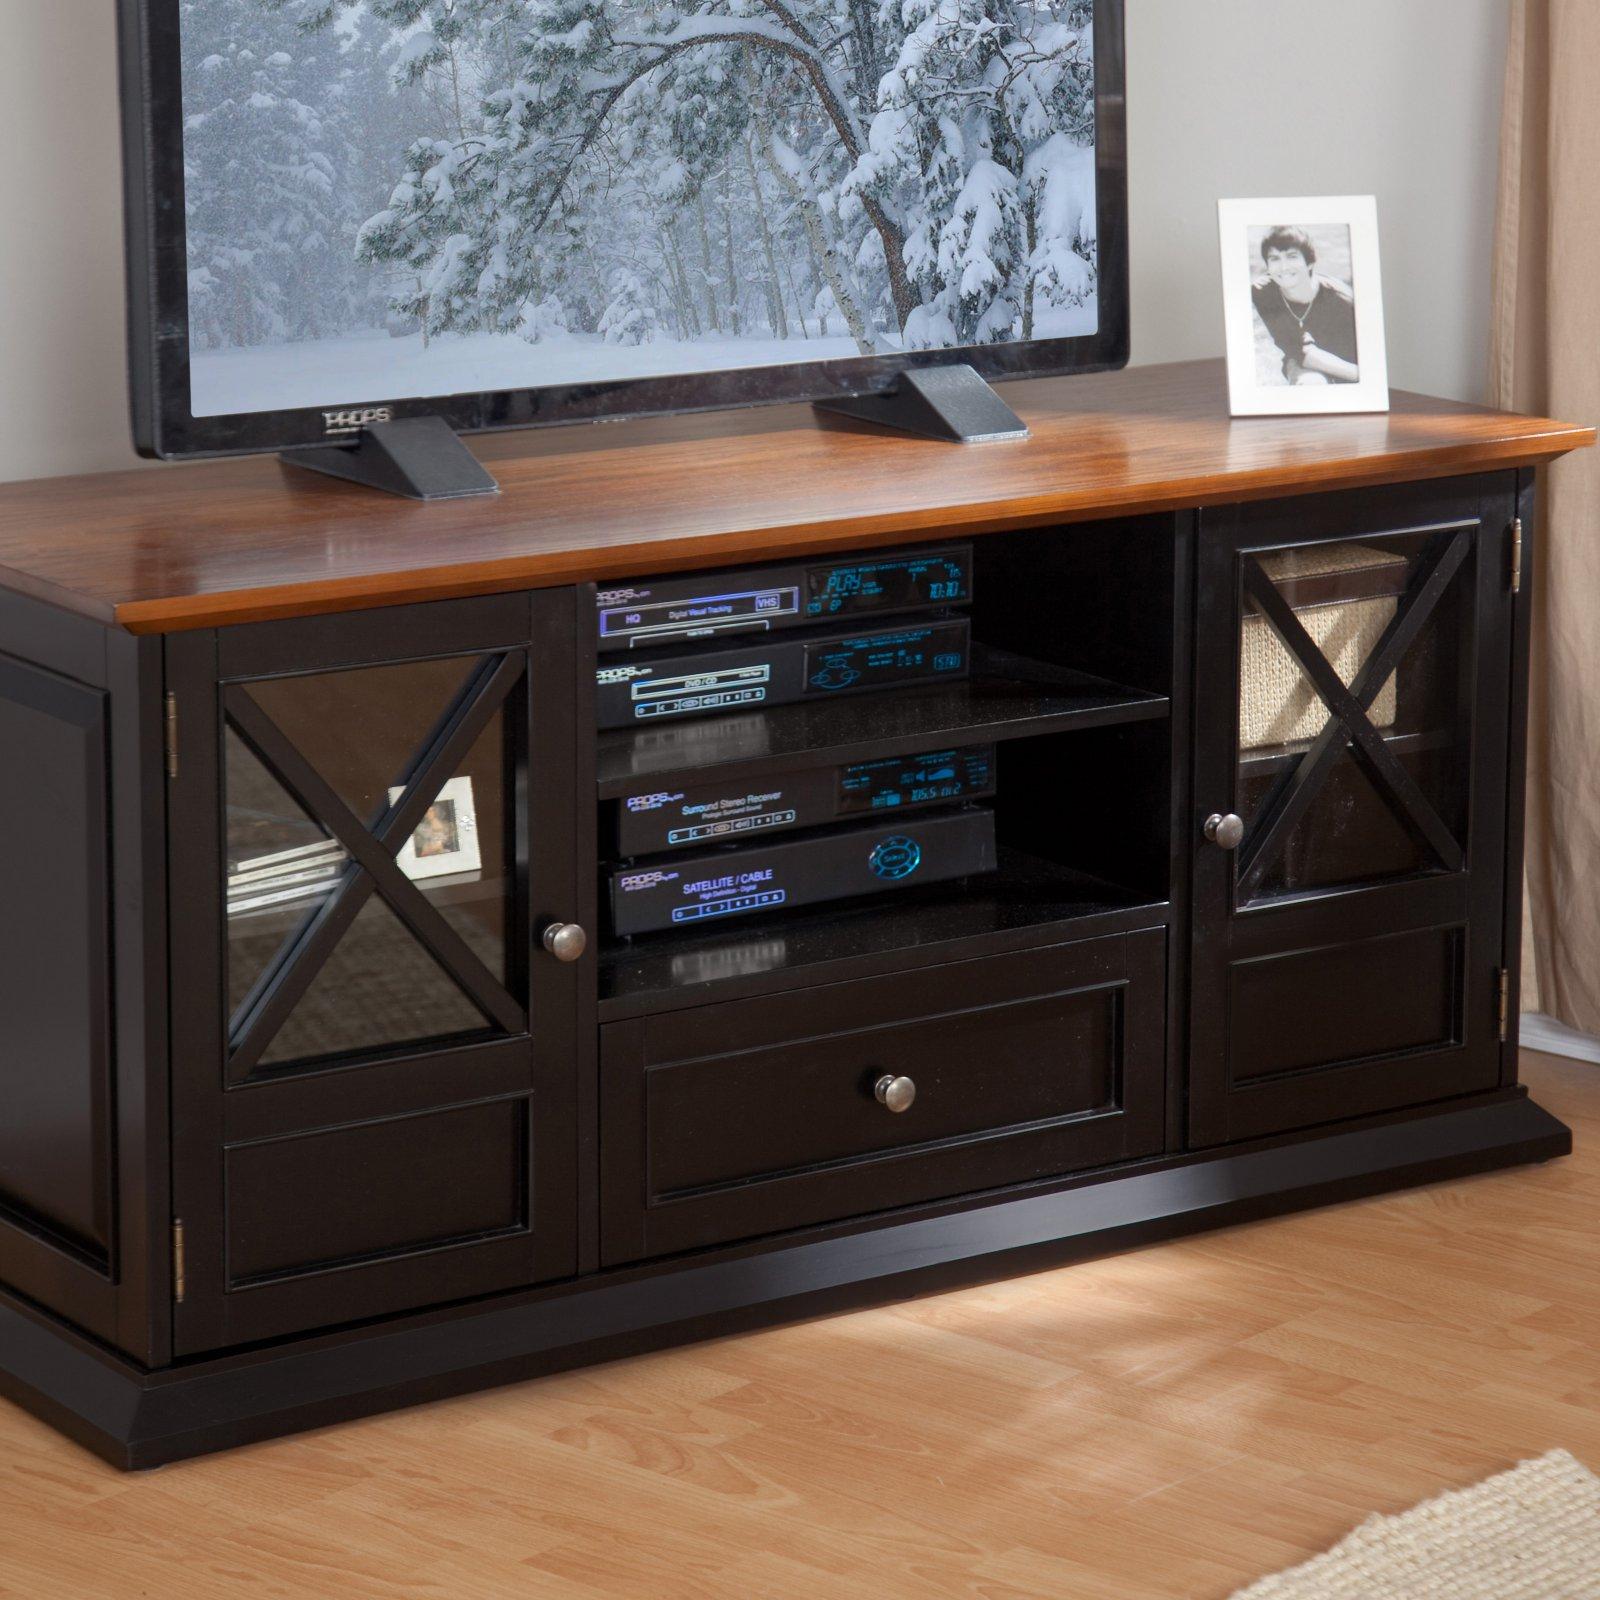 Belham Living Hampton Tv Stand Black Oak Oak Tv Stand Tv Stand 55 Inch Tv Stand Oak tv stands for 55 inch tv